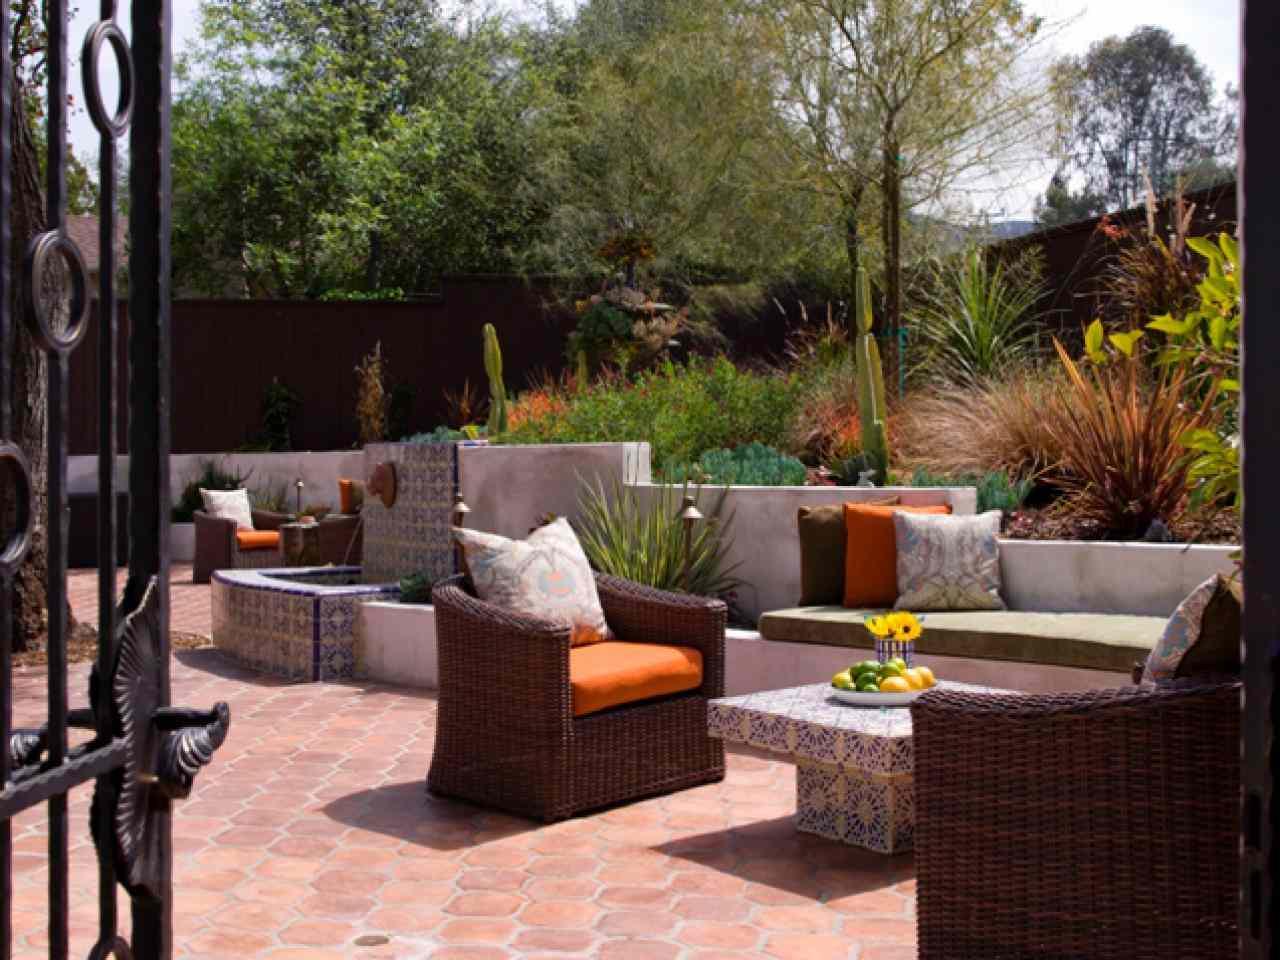 Cuisine: Decoration Salon De Jardin Intended For Wish ... concernant Salons De Jardin Pas Cher